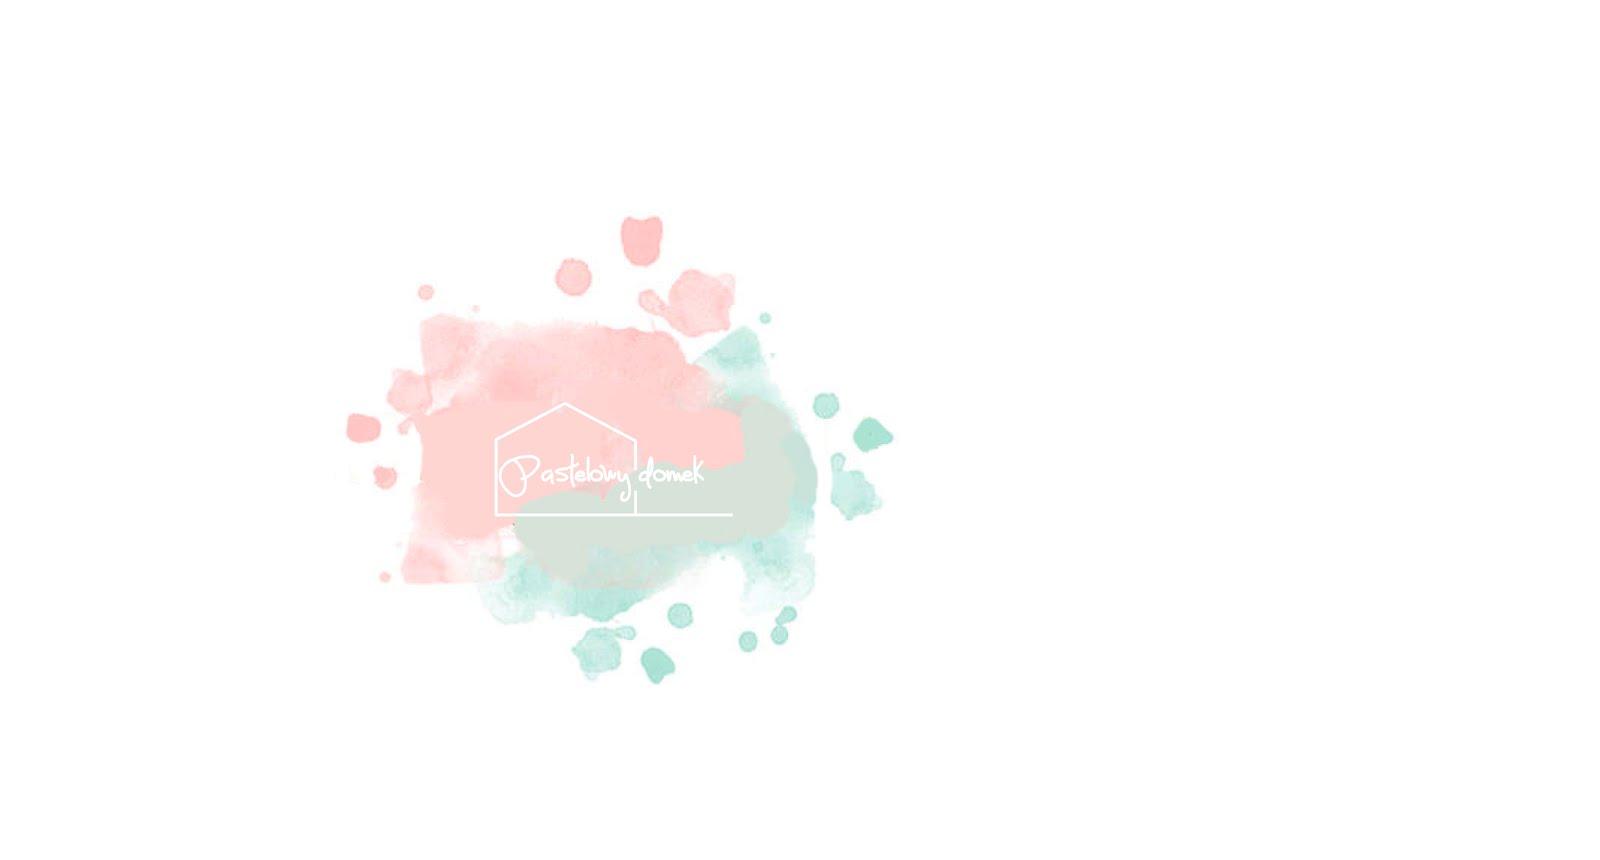 Pastelowy domek